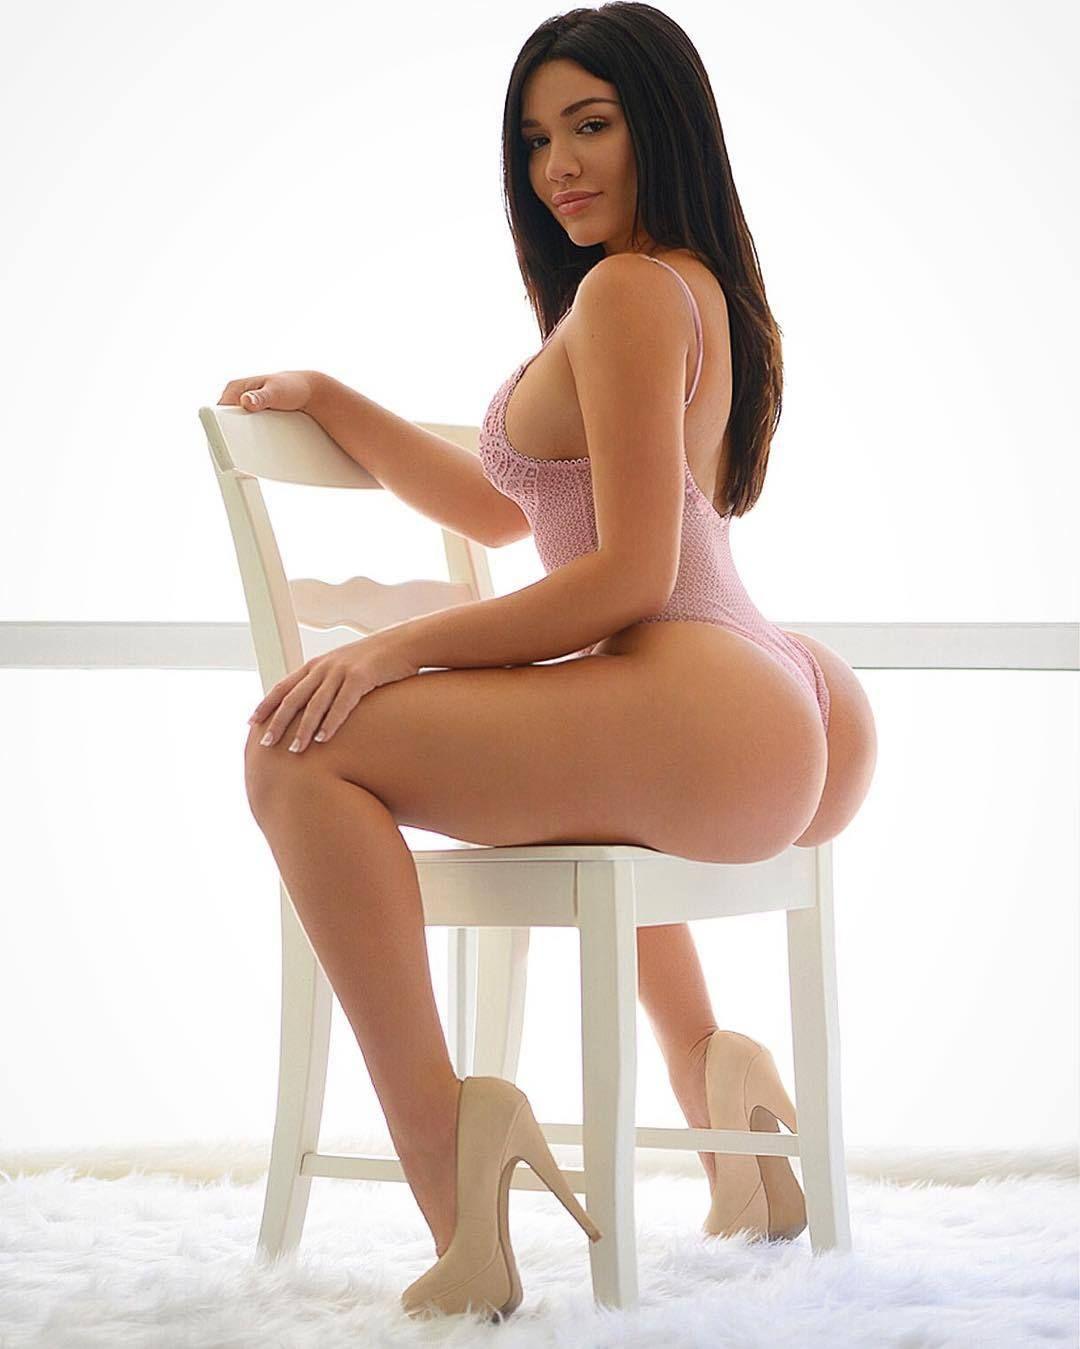 Hot Booty Genesis Mia Lopez naked photo 2017